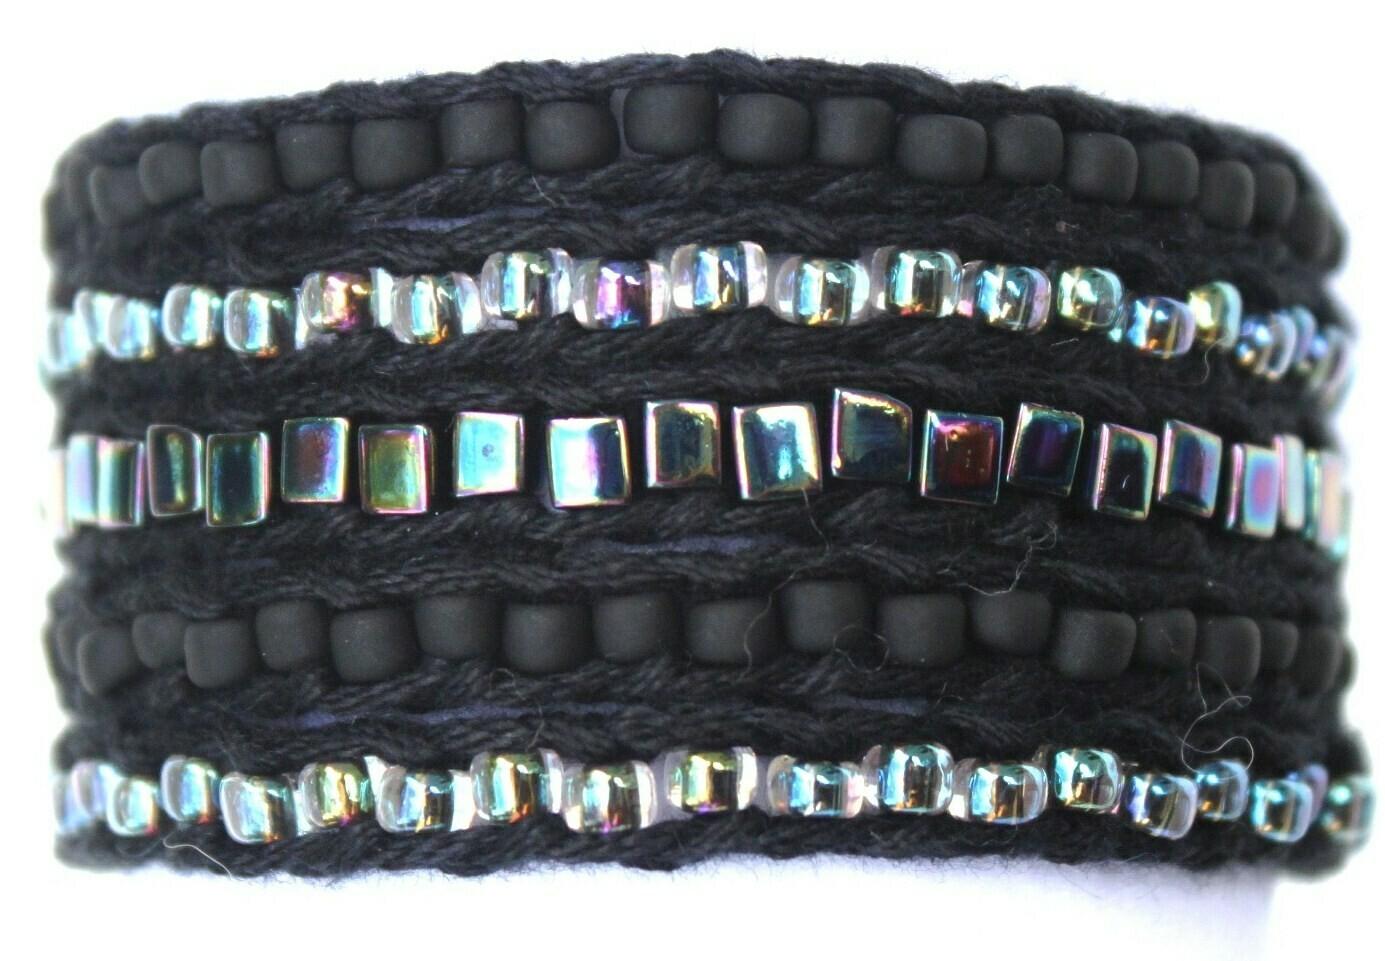 LuLi Bracelet Kit - Titanium (black with iridescent rainbow)